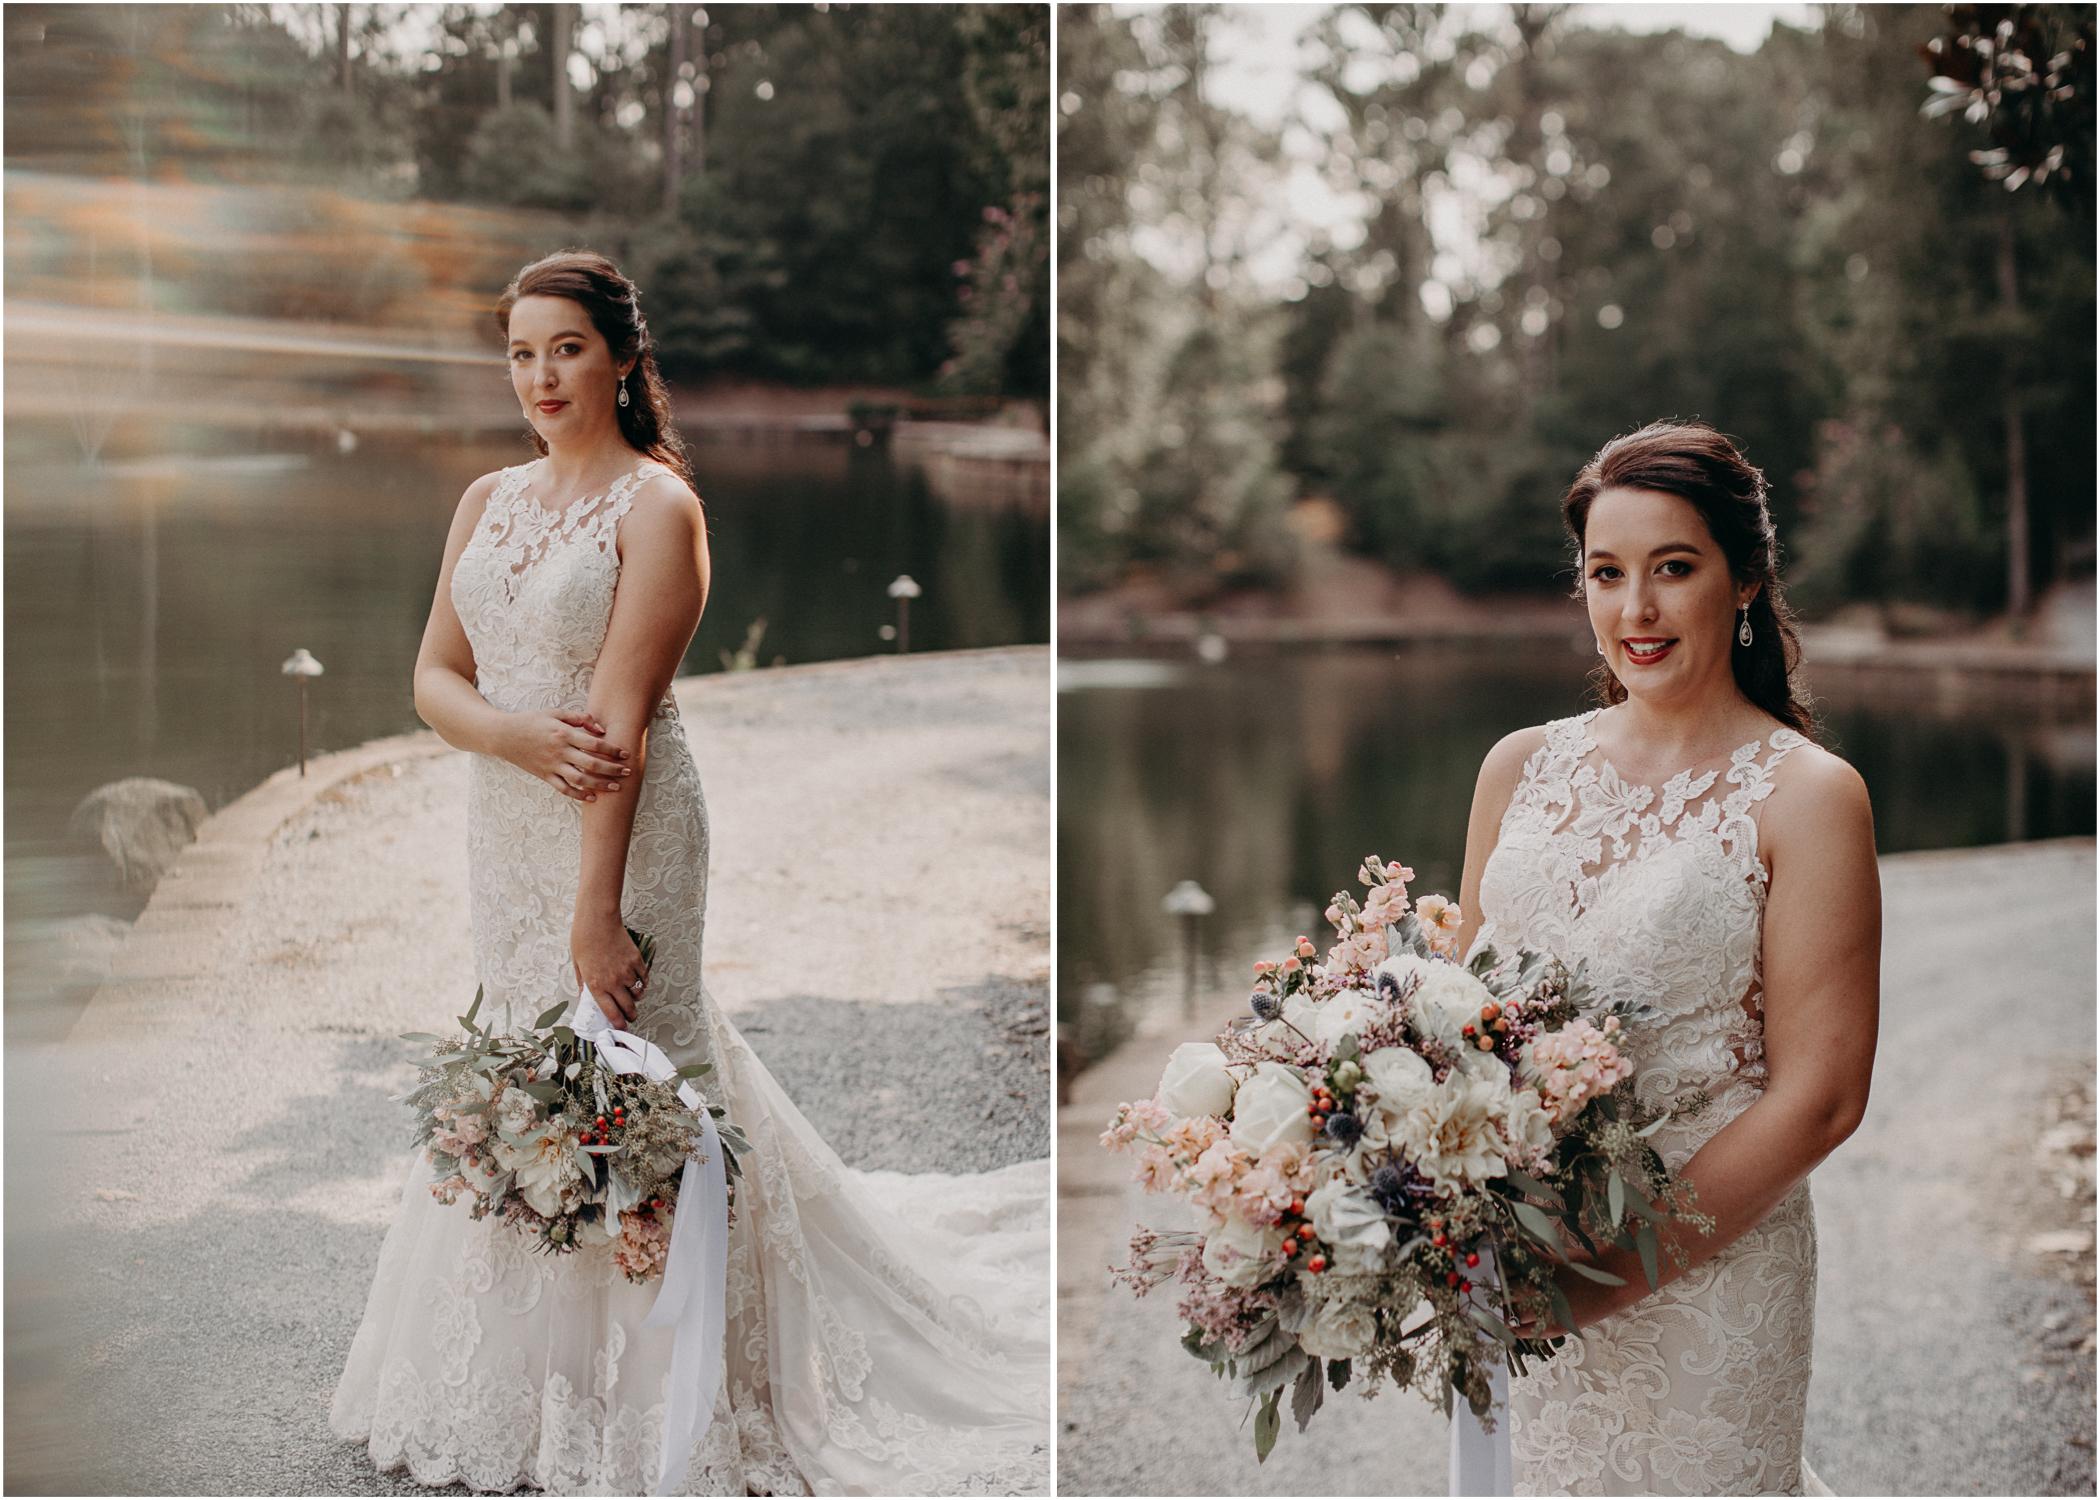 35 wedding day portraits bride and groom atlanta - georgia - ga wedding photographer .jpg